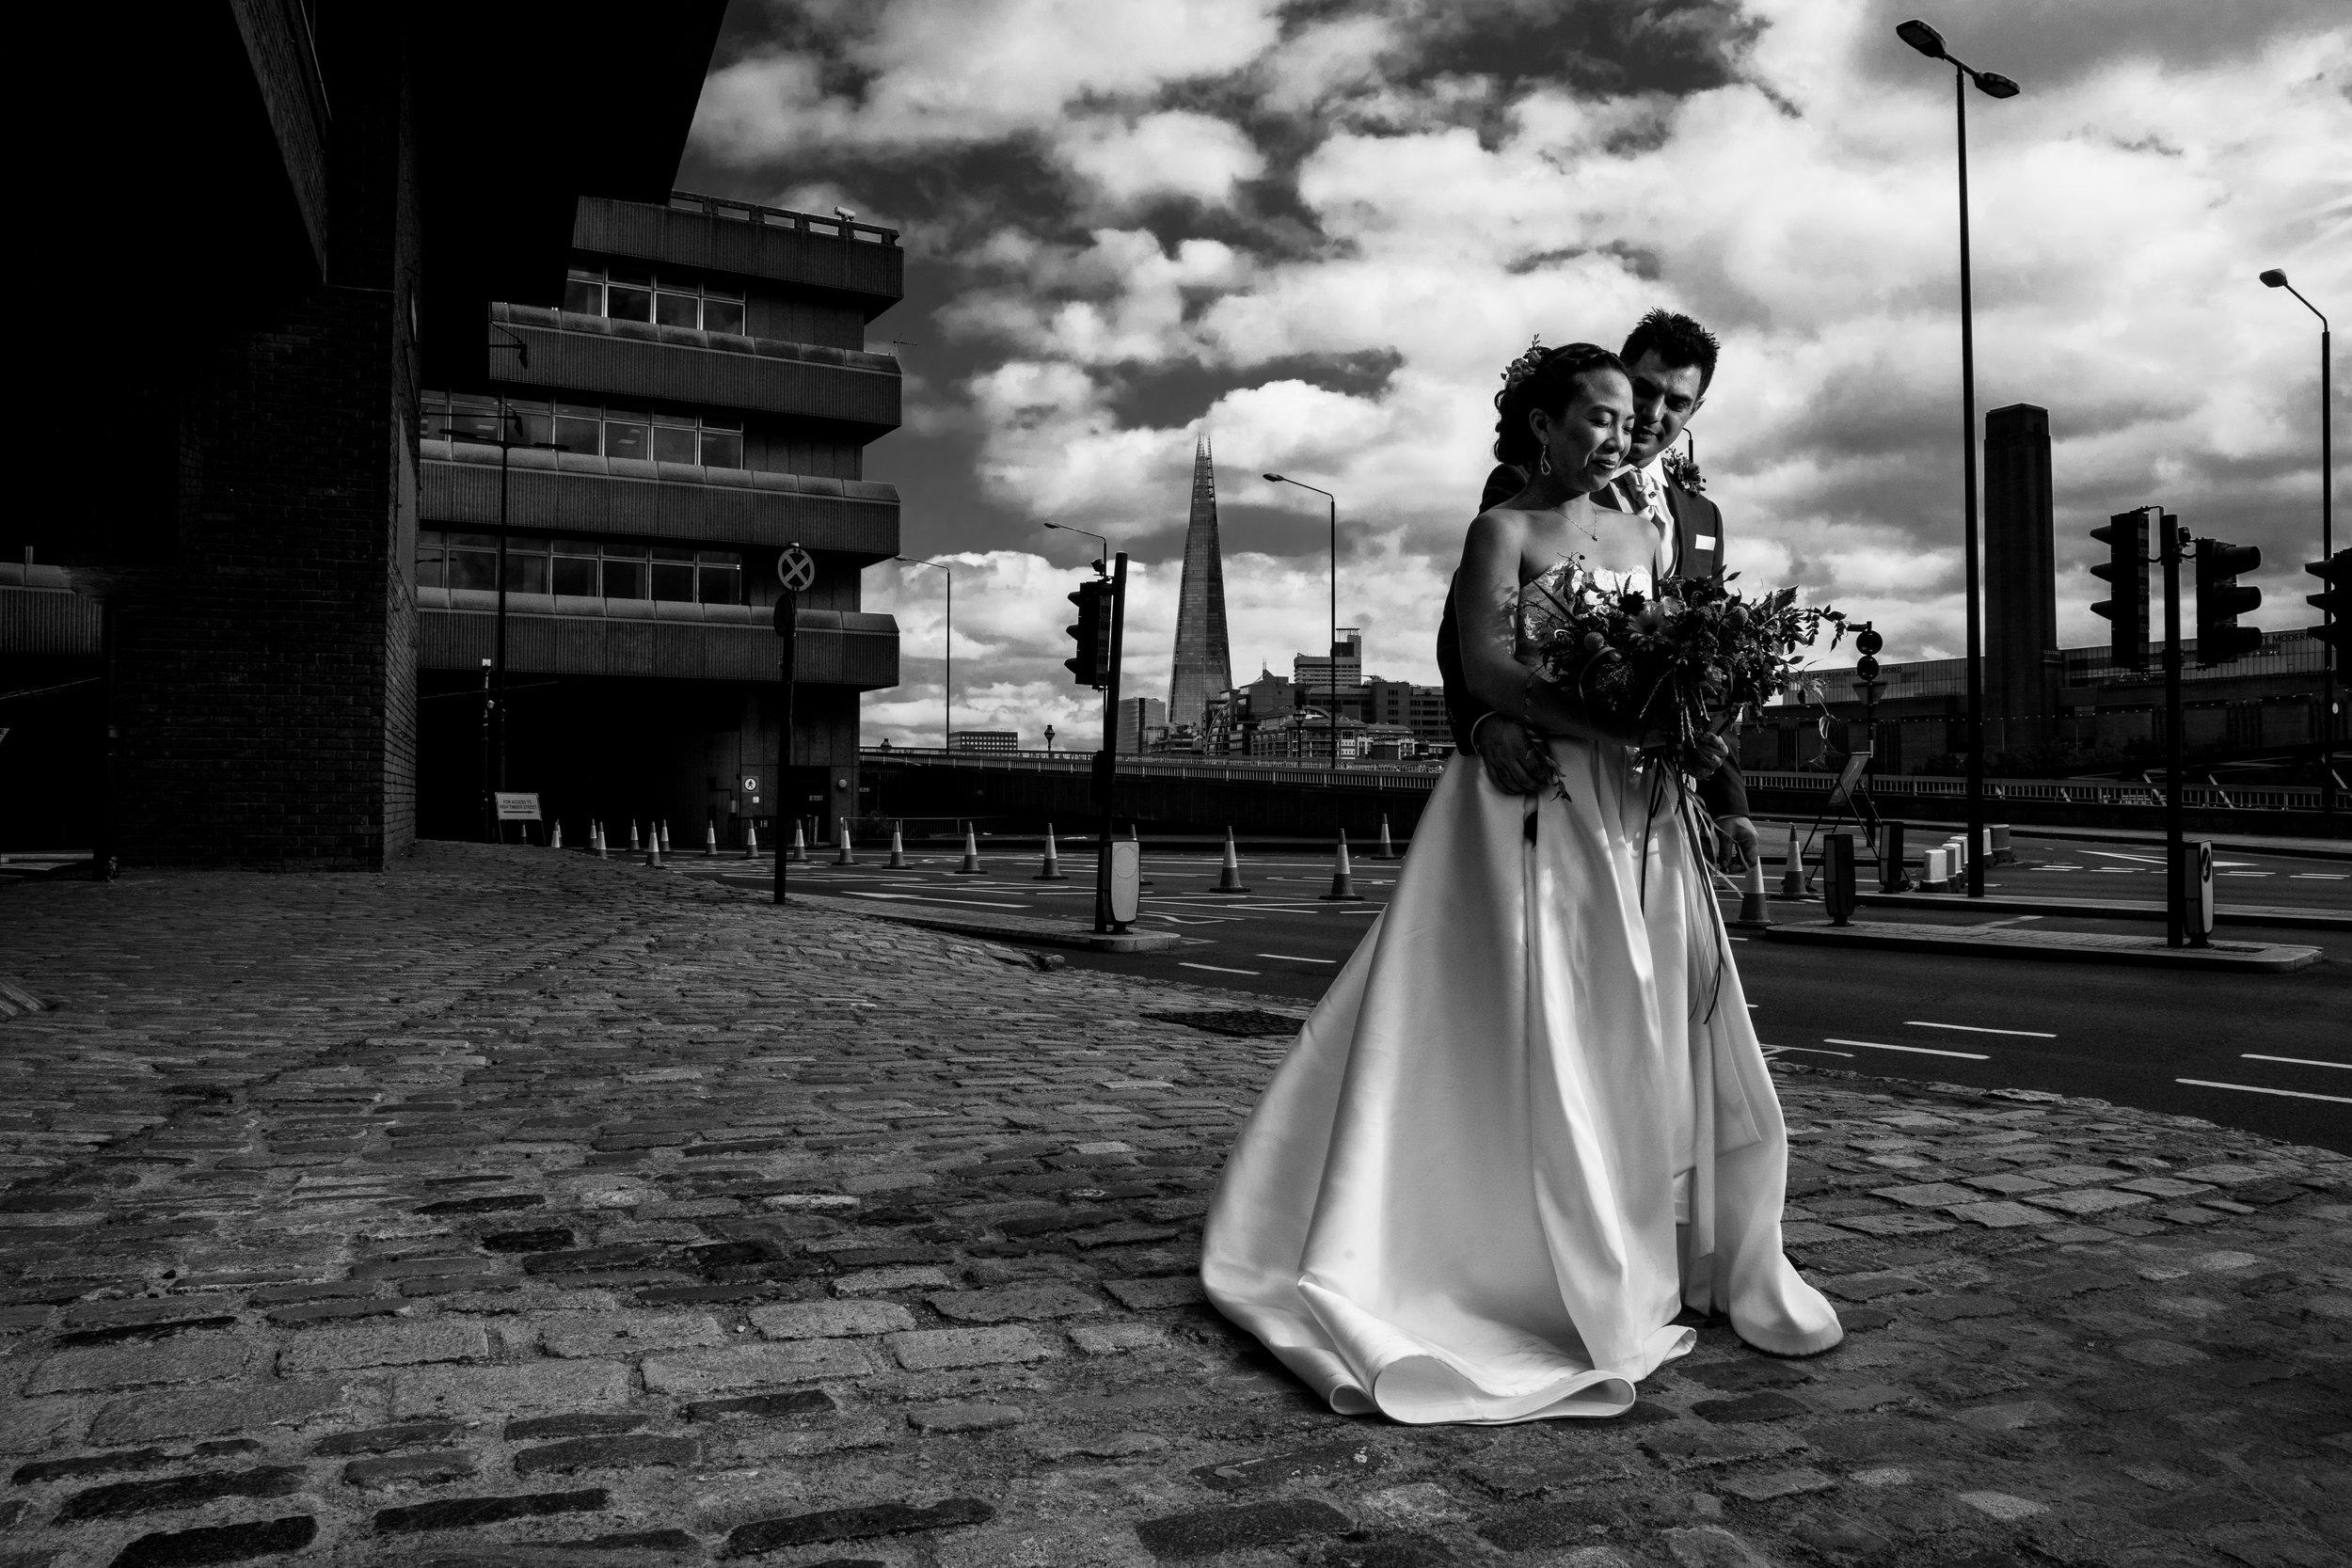 river-rooms-blackfriars-london-stpauls-mondrian-hotel-wedding-photography-videography-49